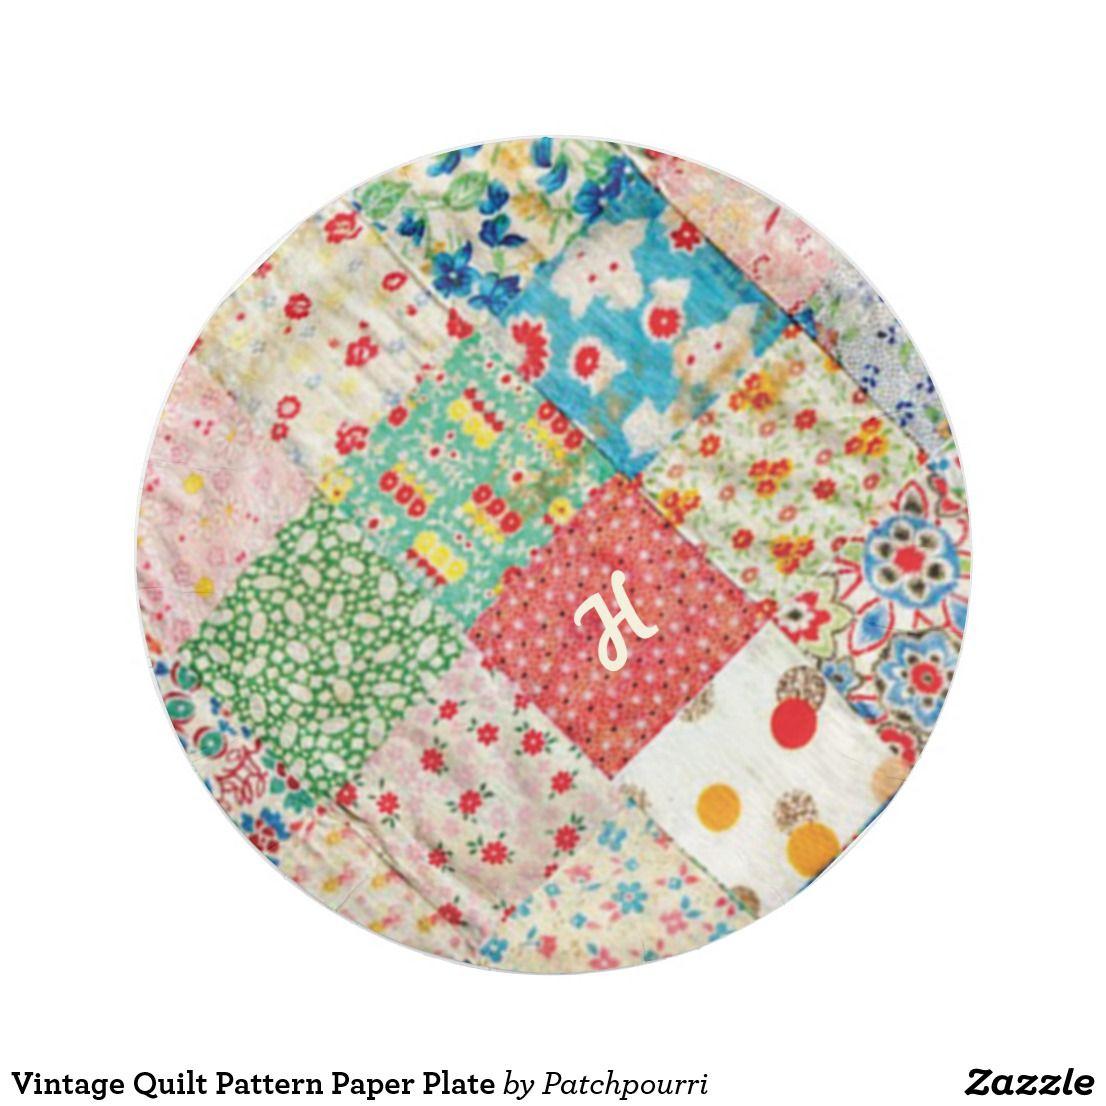 Vintage Quilt Pattern Paper Plate  sc 1 st  Pinterest & Vintage Quilt Pattern Paper Plate | Vintage quilts patterns